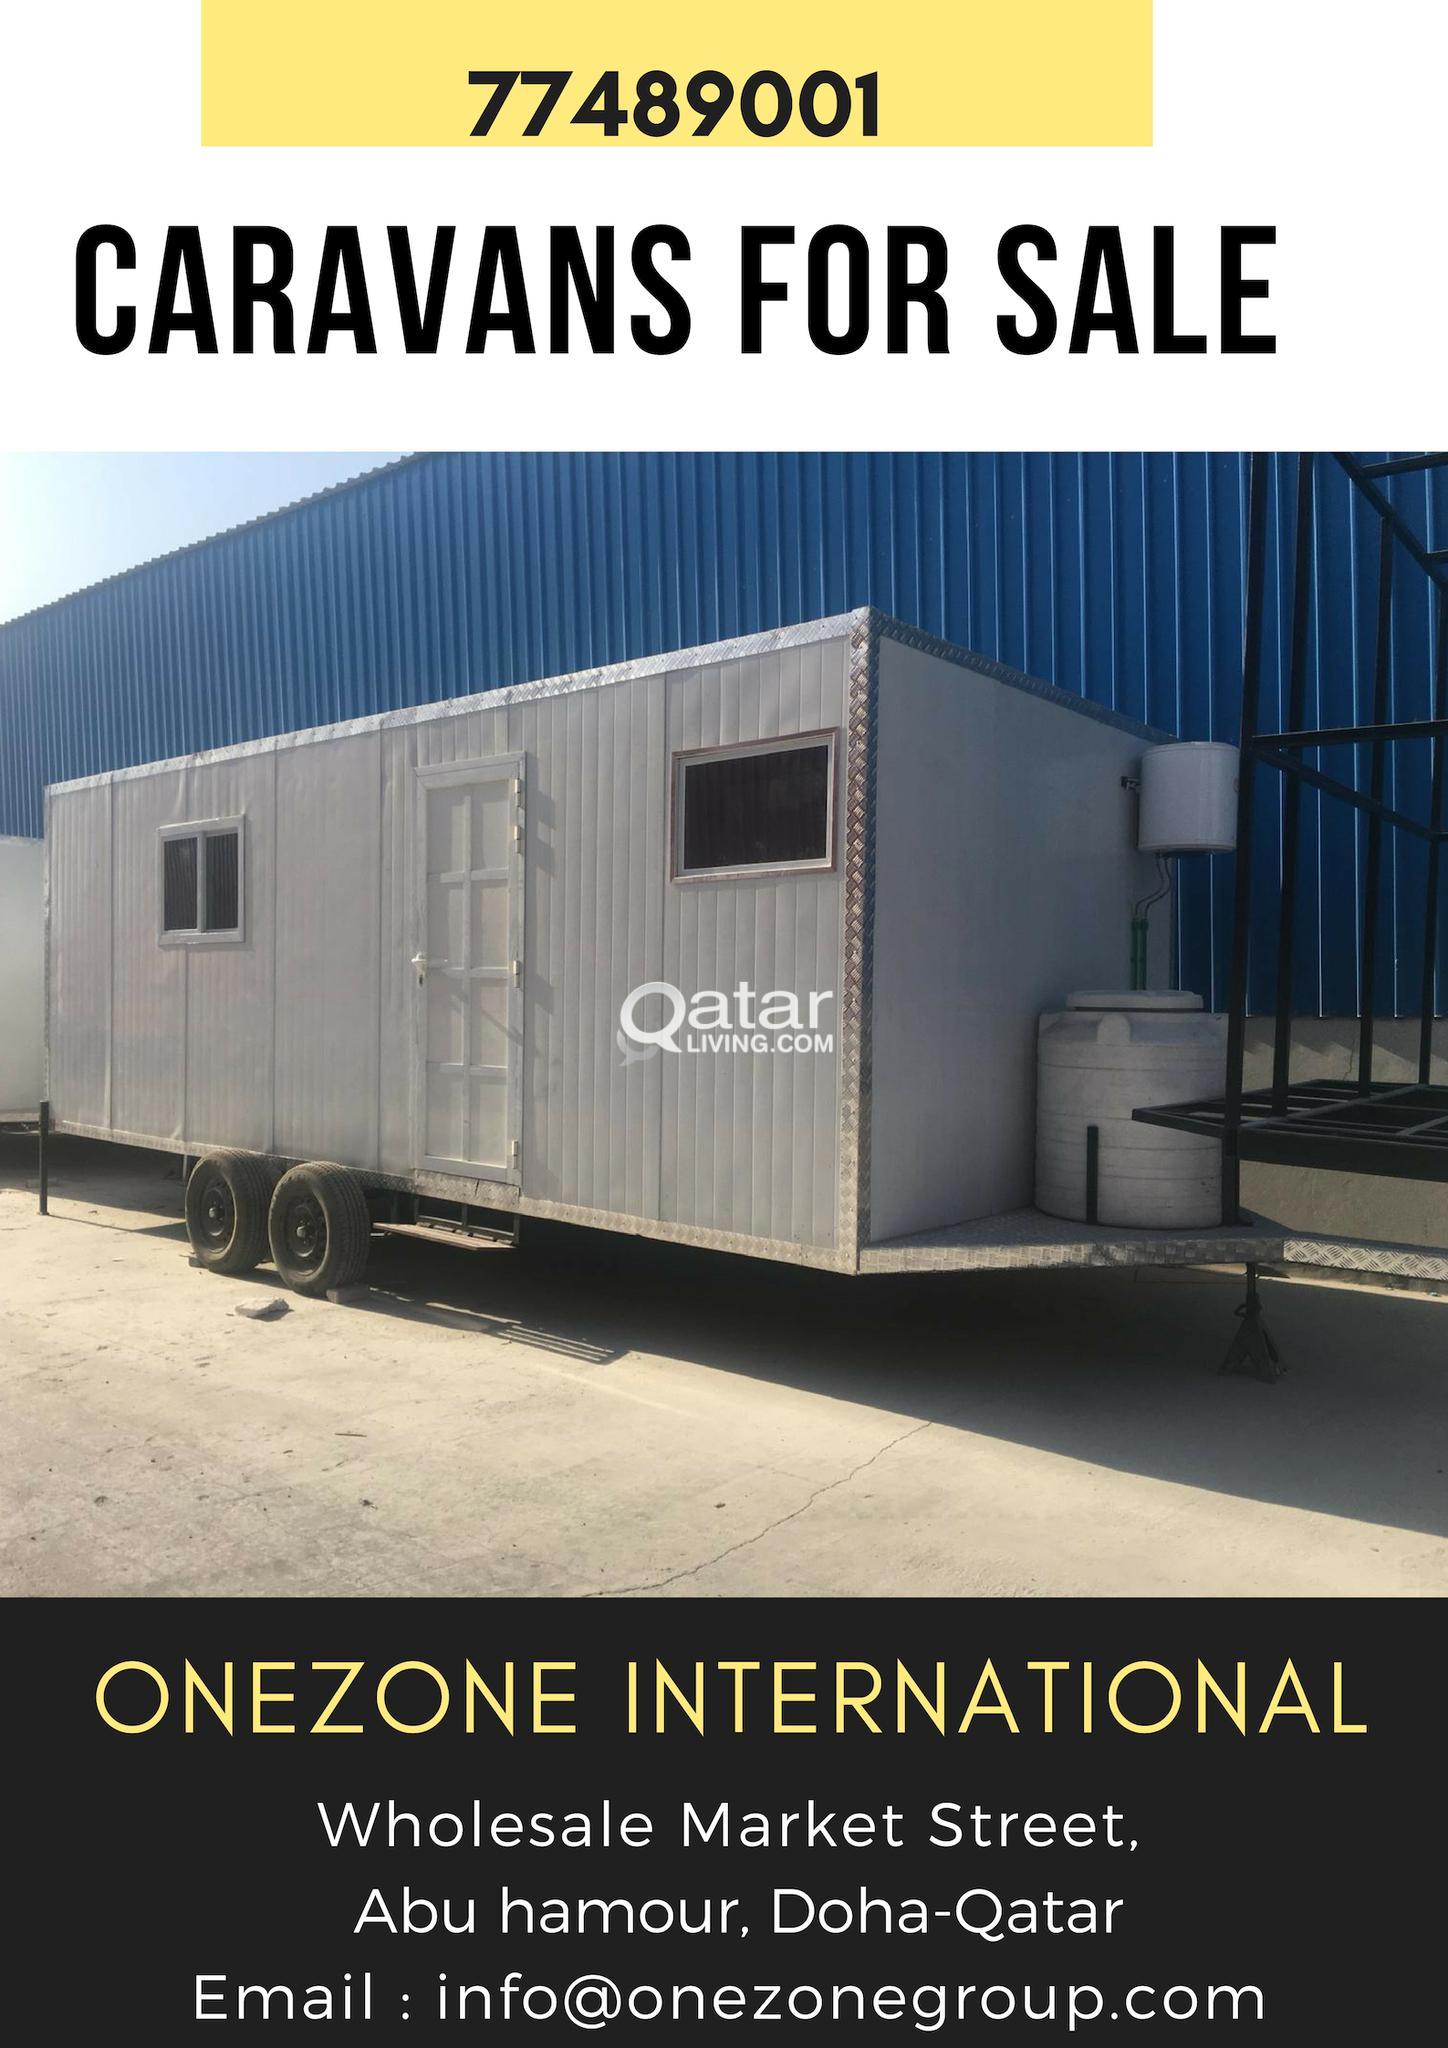 New Caravans for Sale | Qatar Living